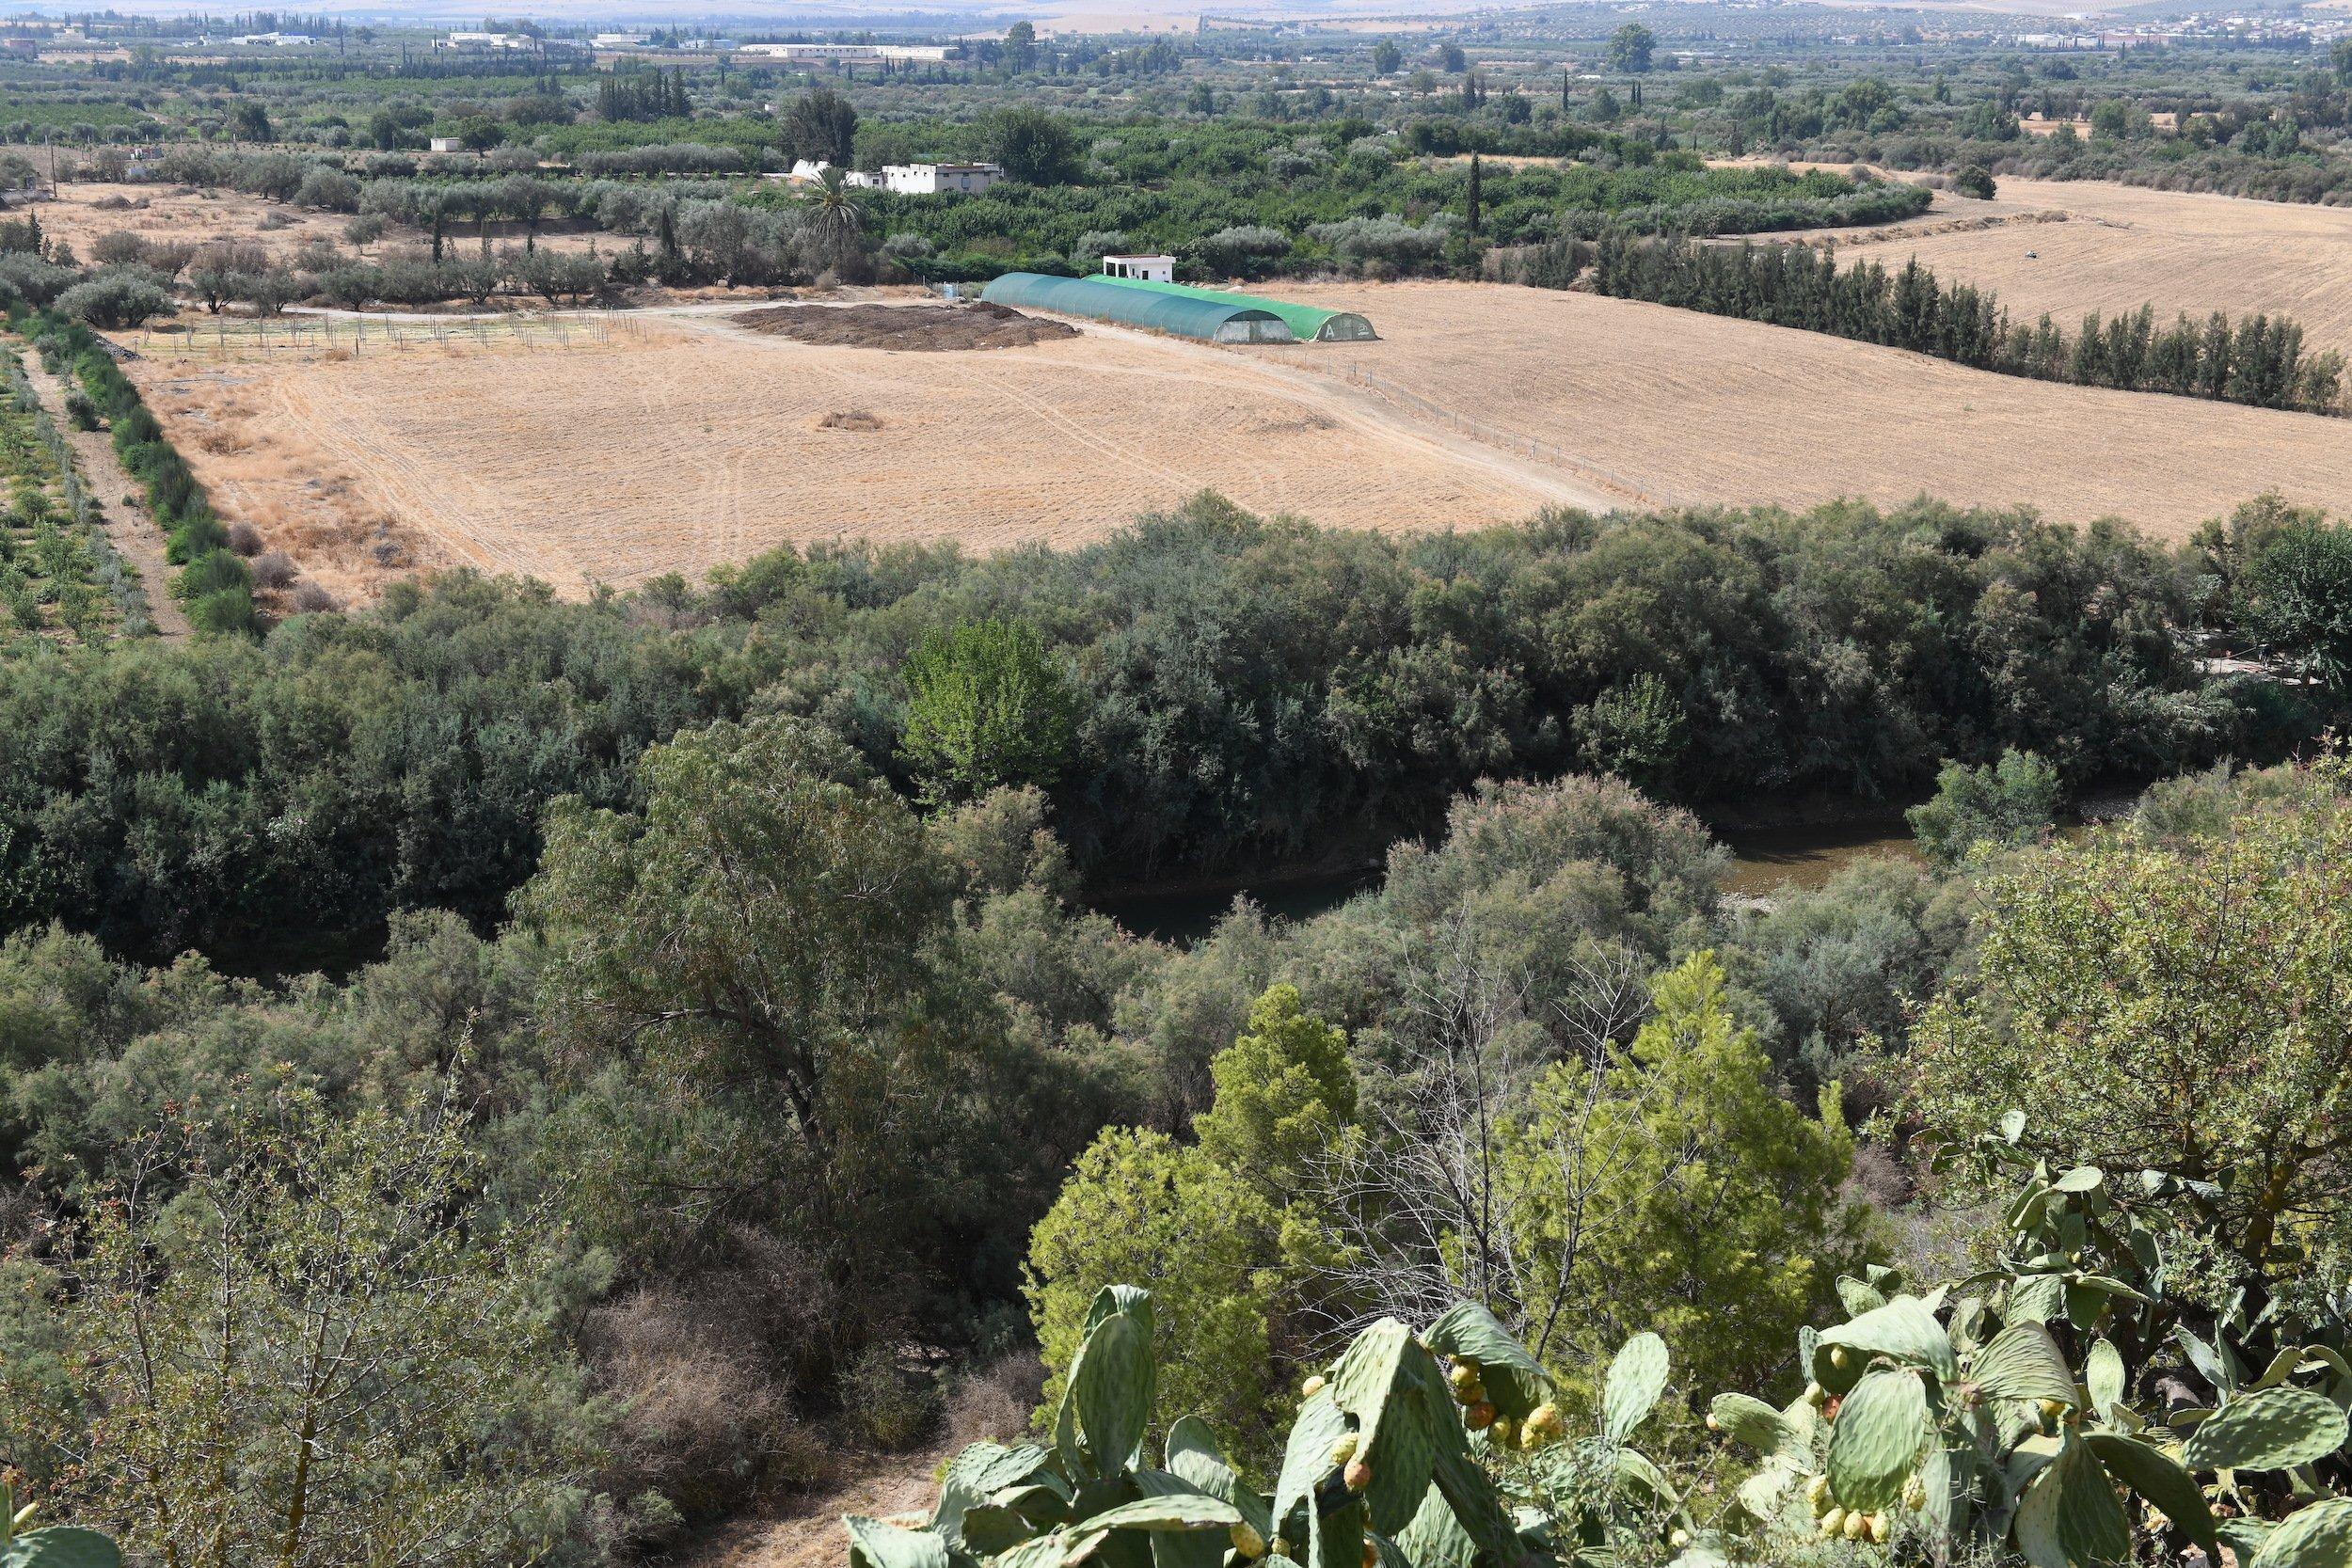 Felder direkt am Flusslauf des Oued Medjerda